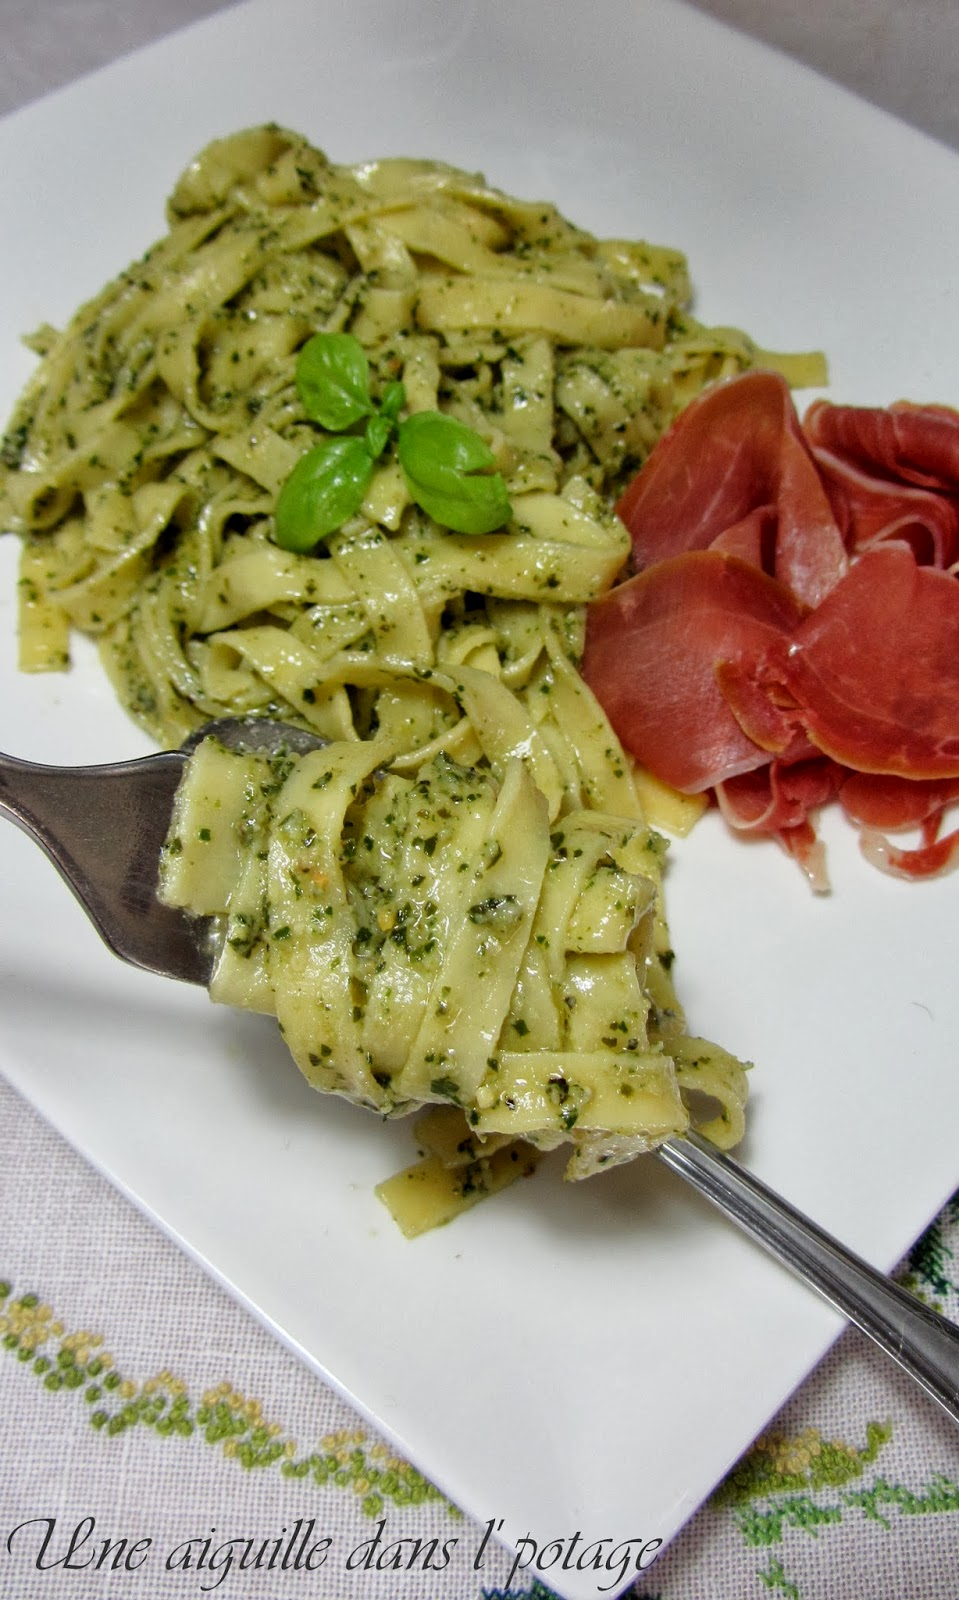 pâtes-tagliatelles-basilic-parmesan-pignon de pin-huile d'olive